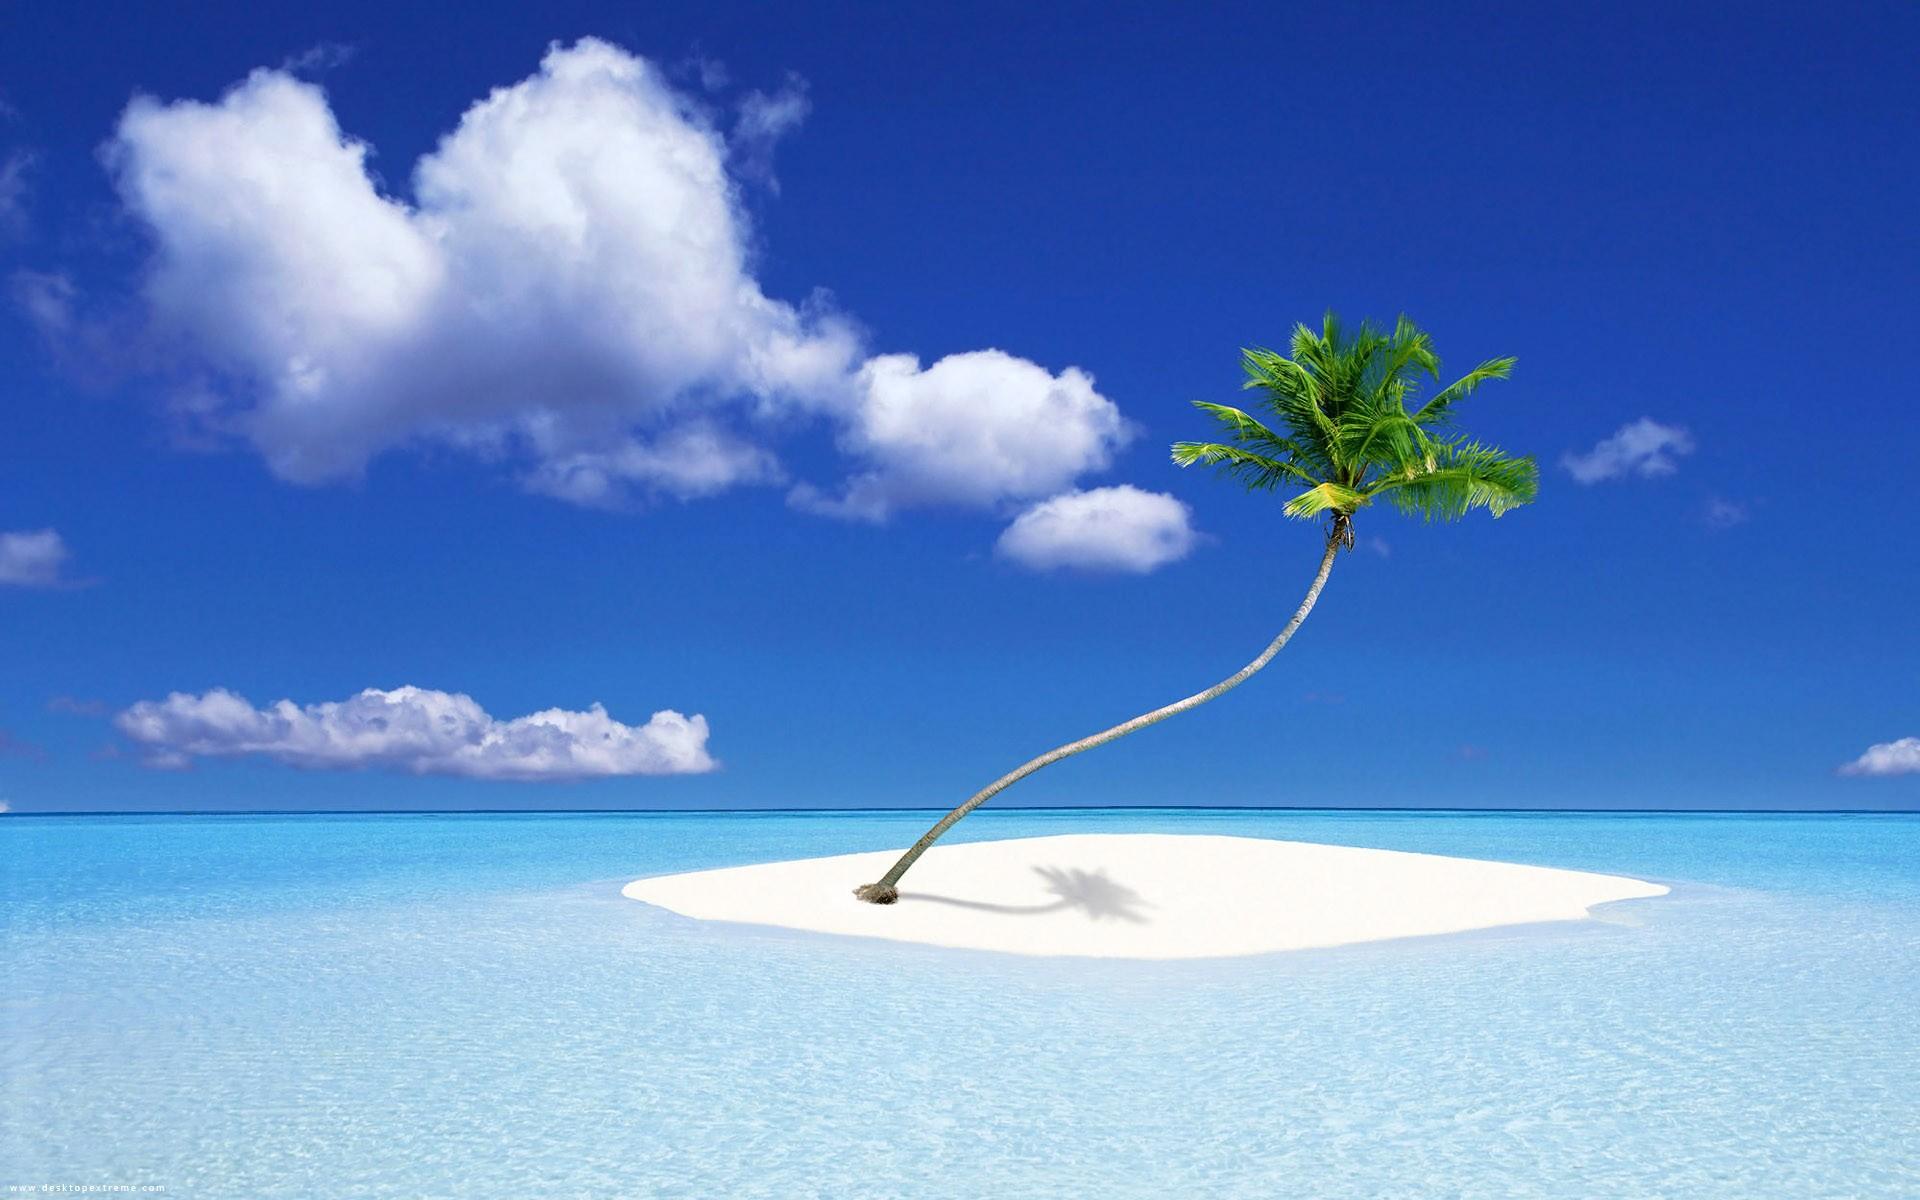 Una isla con una palmera - 1920x1200